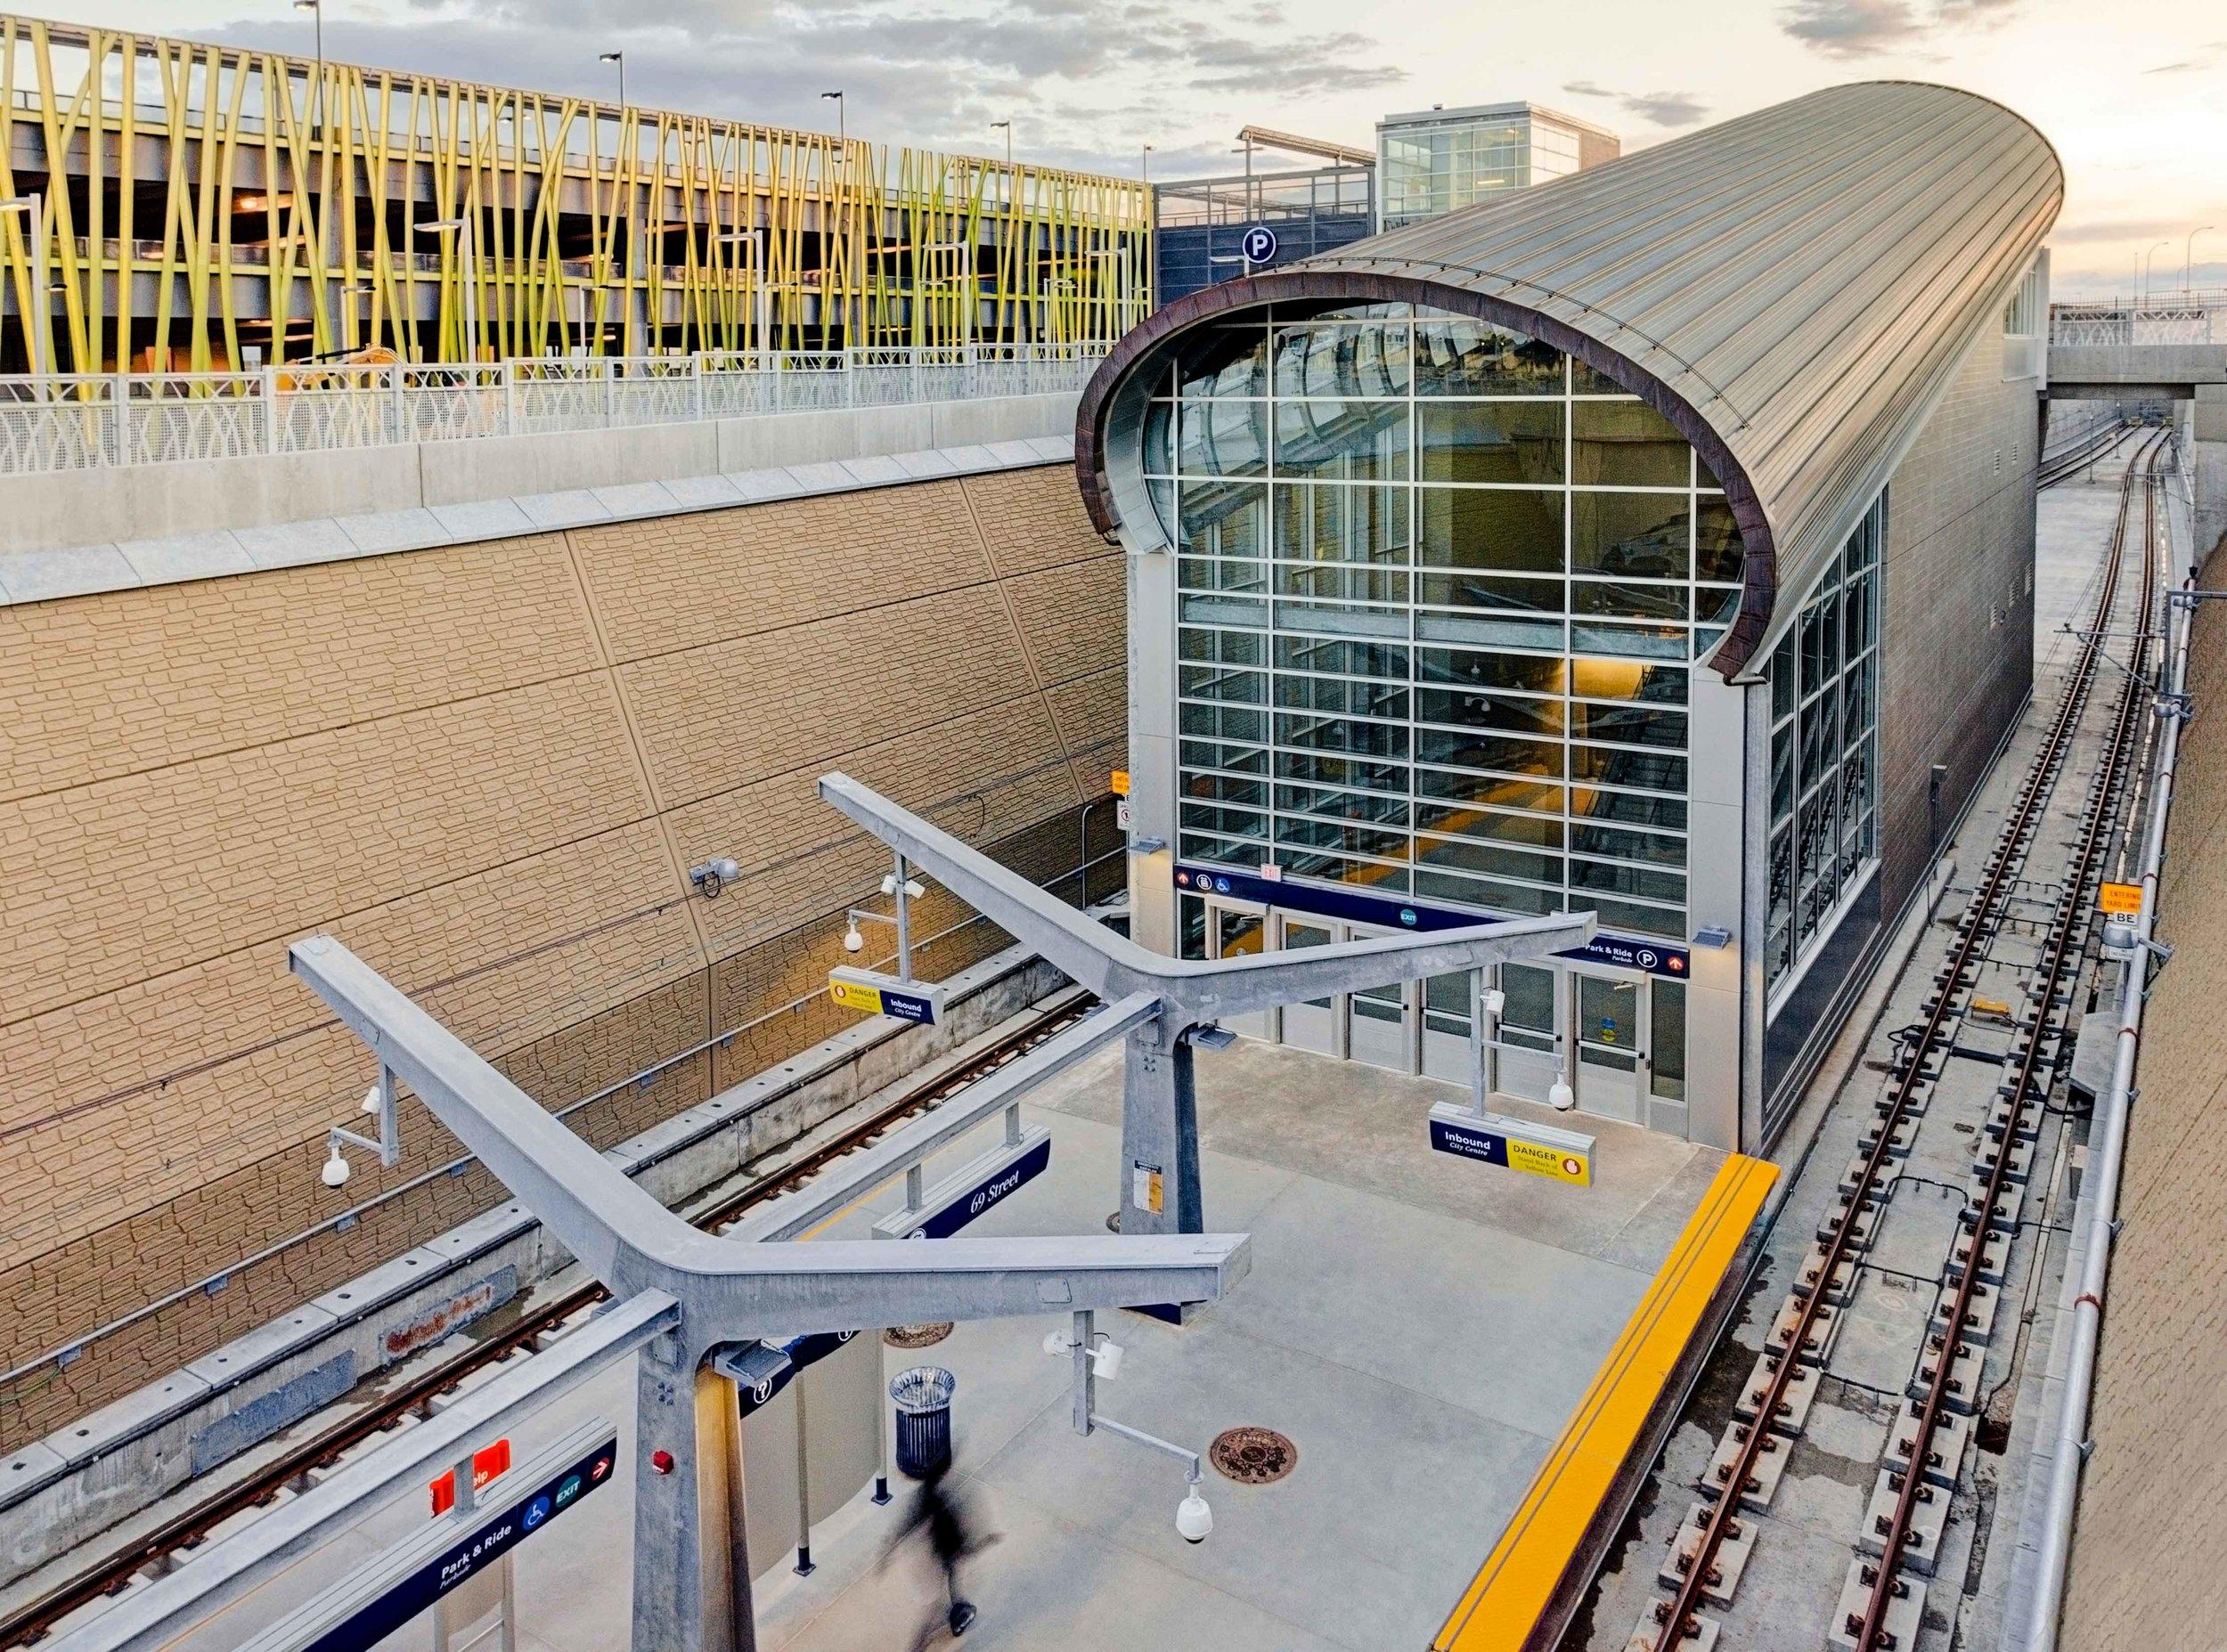 69th Street LRT Station